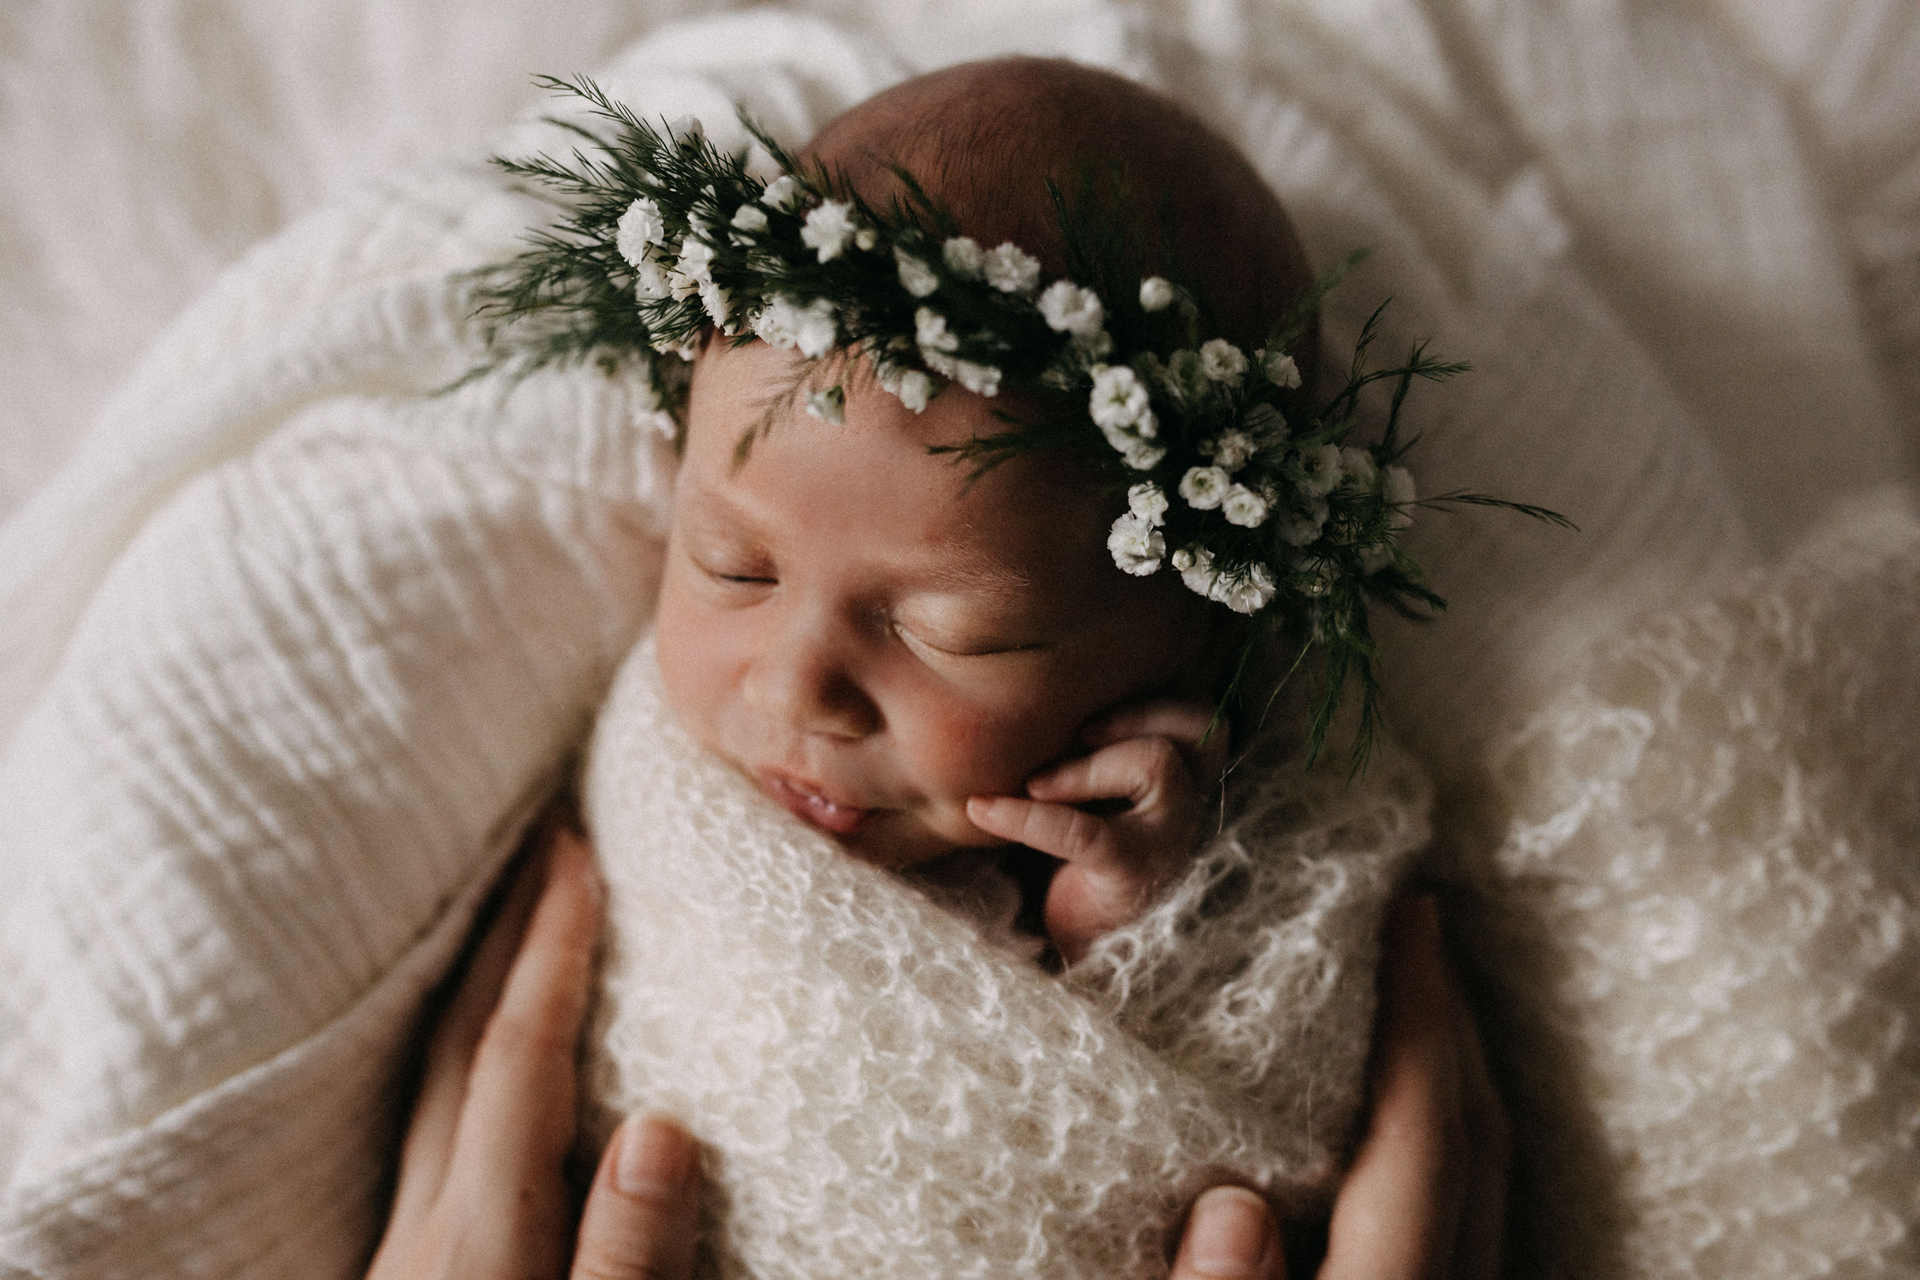 NewbornshootingFotograf Wiesbaden